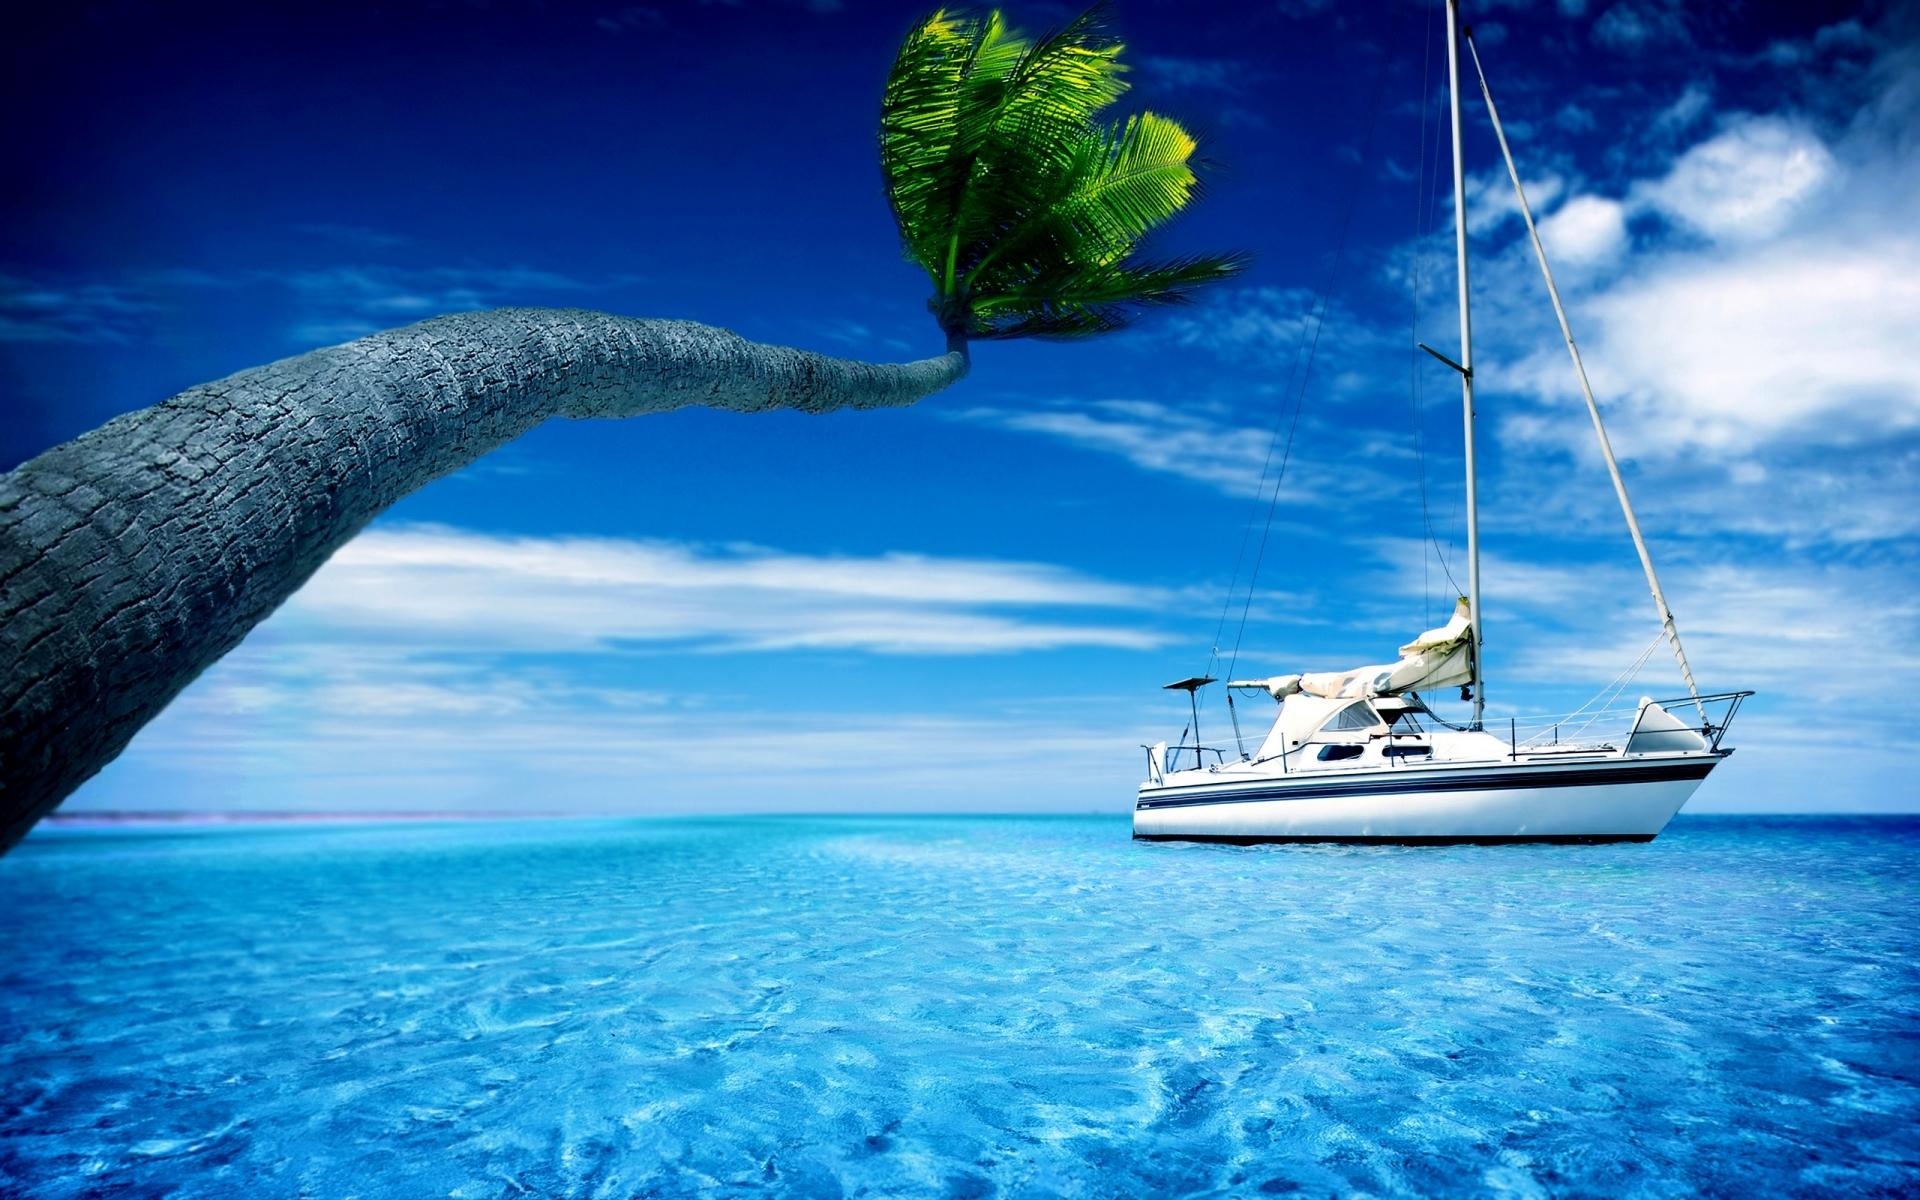 Paradise Island Wallpaper | HD Wallpapers Desktop